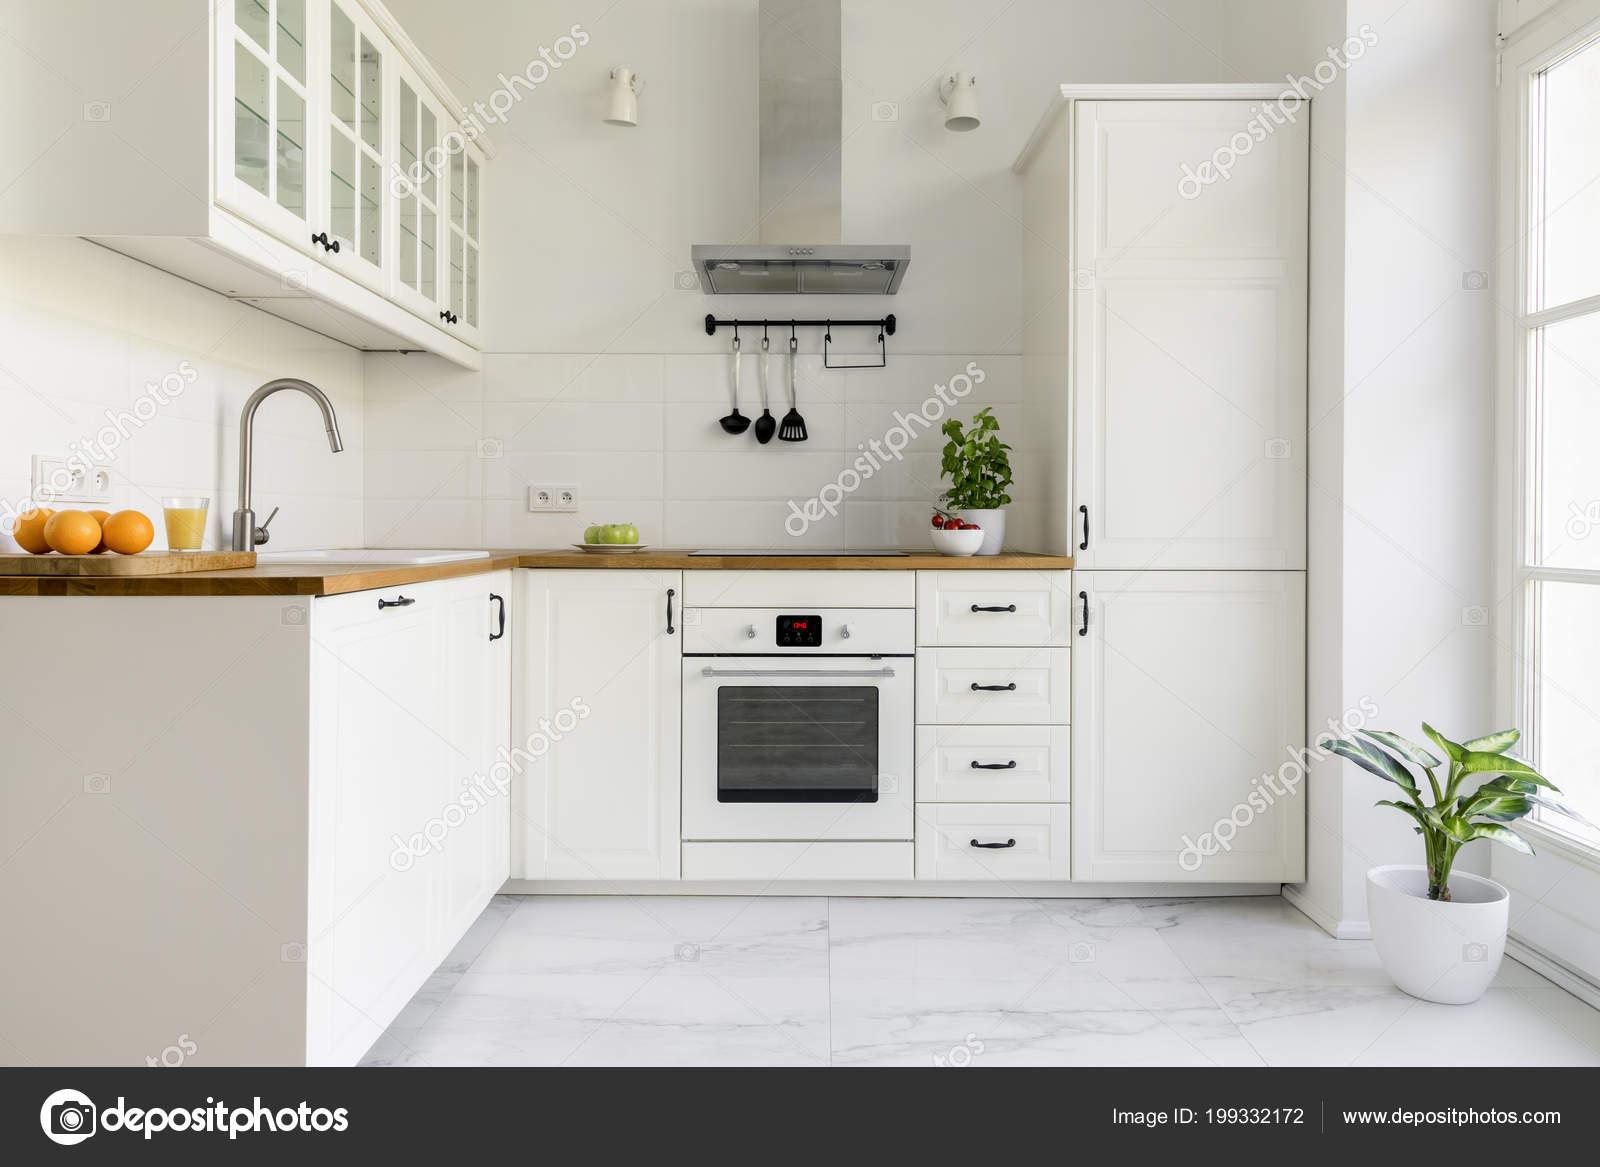 Campana blanca madera campana plata interior m nima - Cocina blanca encimera madera ...